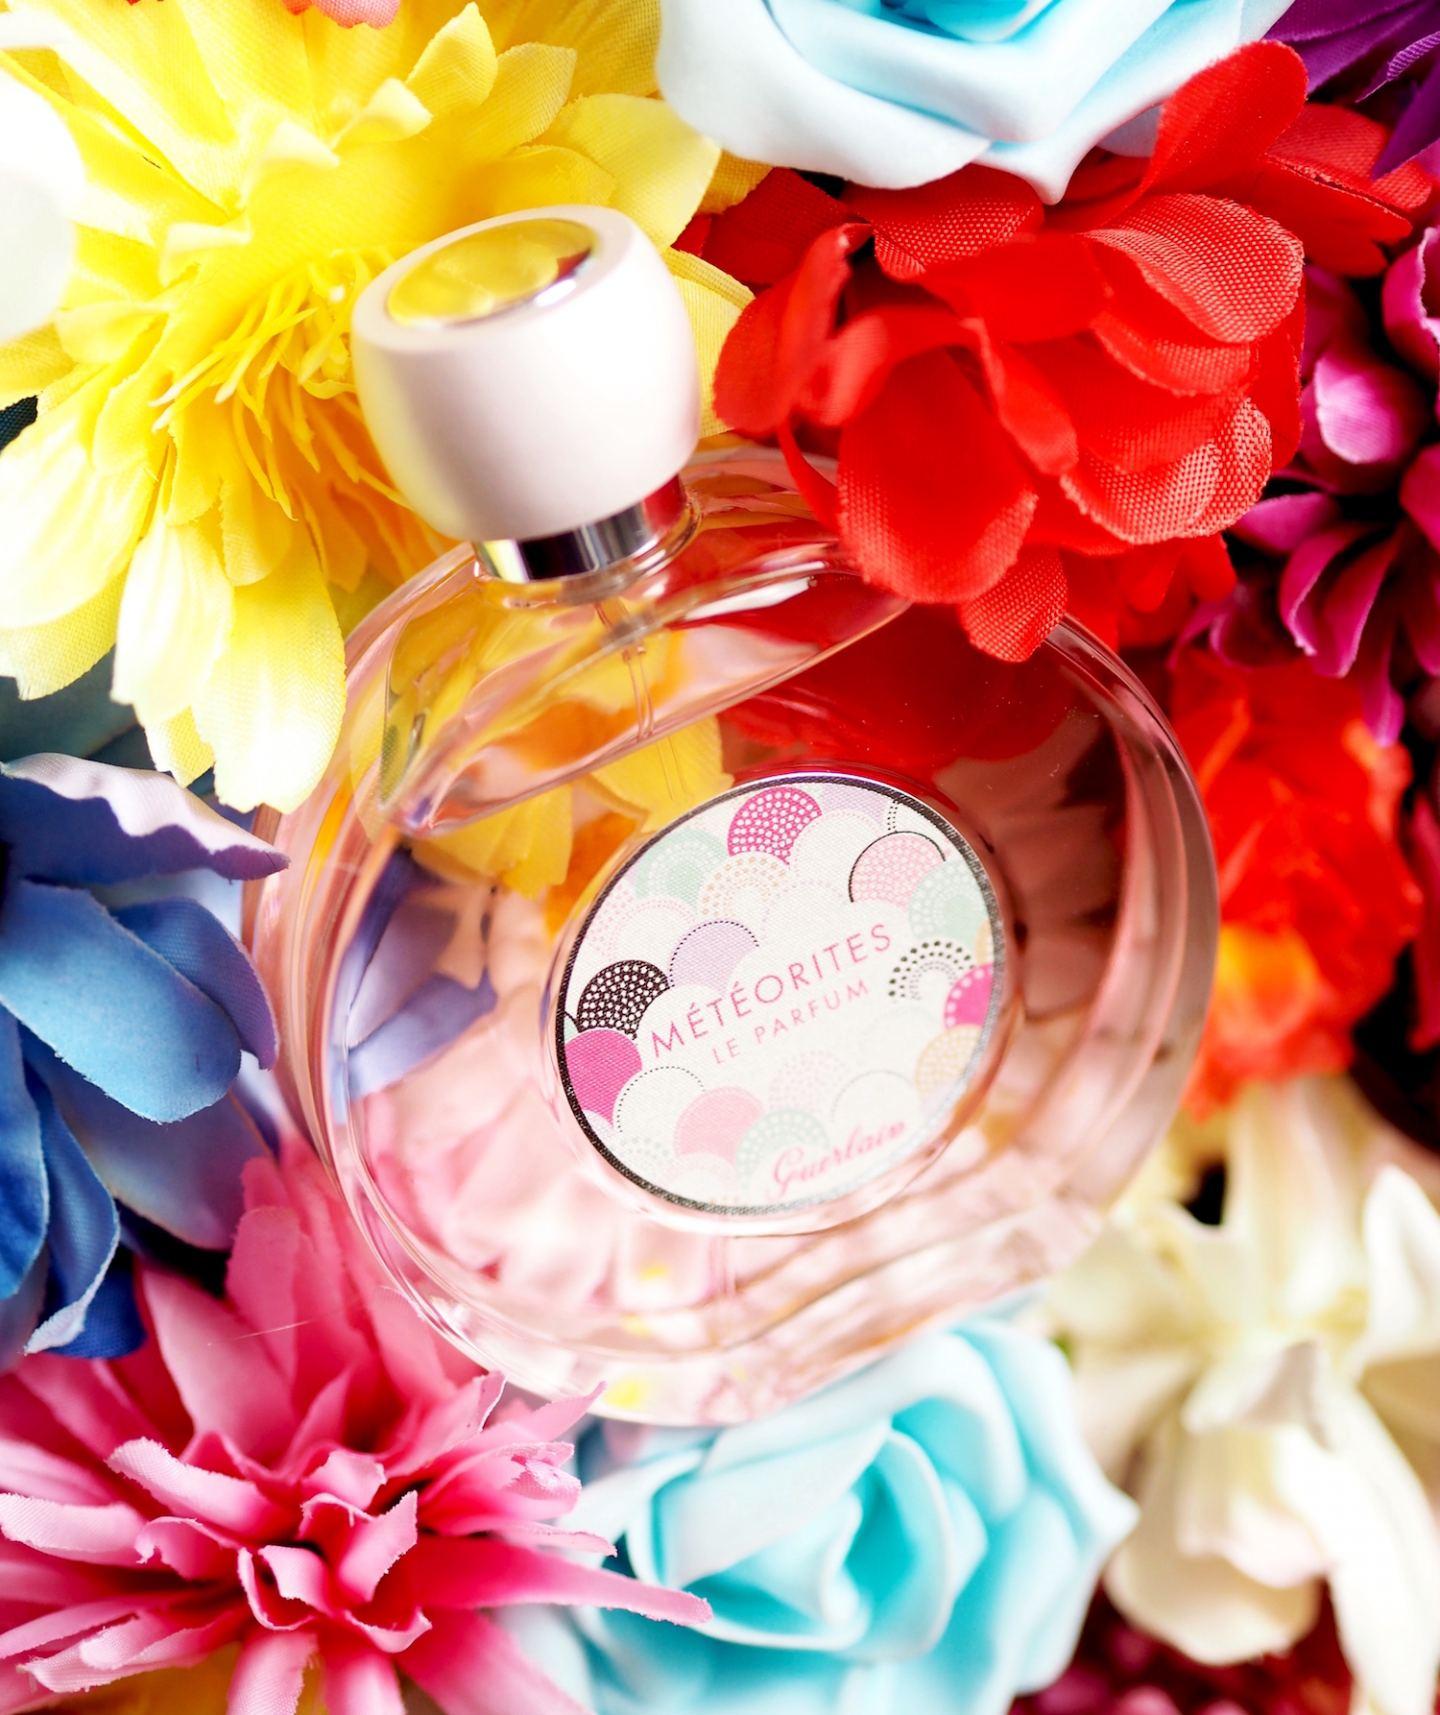 Guerlain 'Météorites' Le Parfum perfume